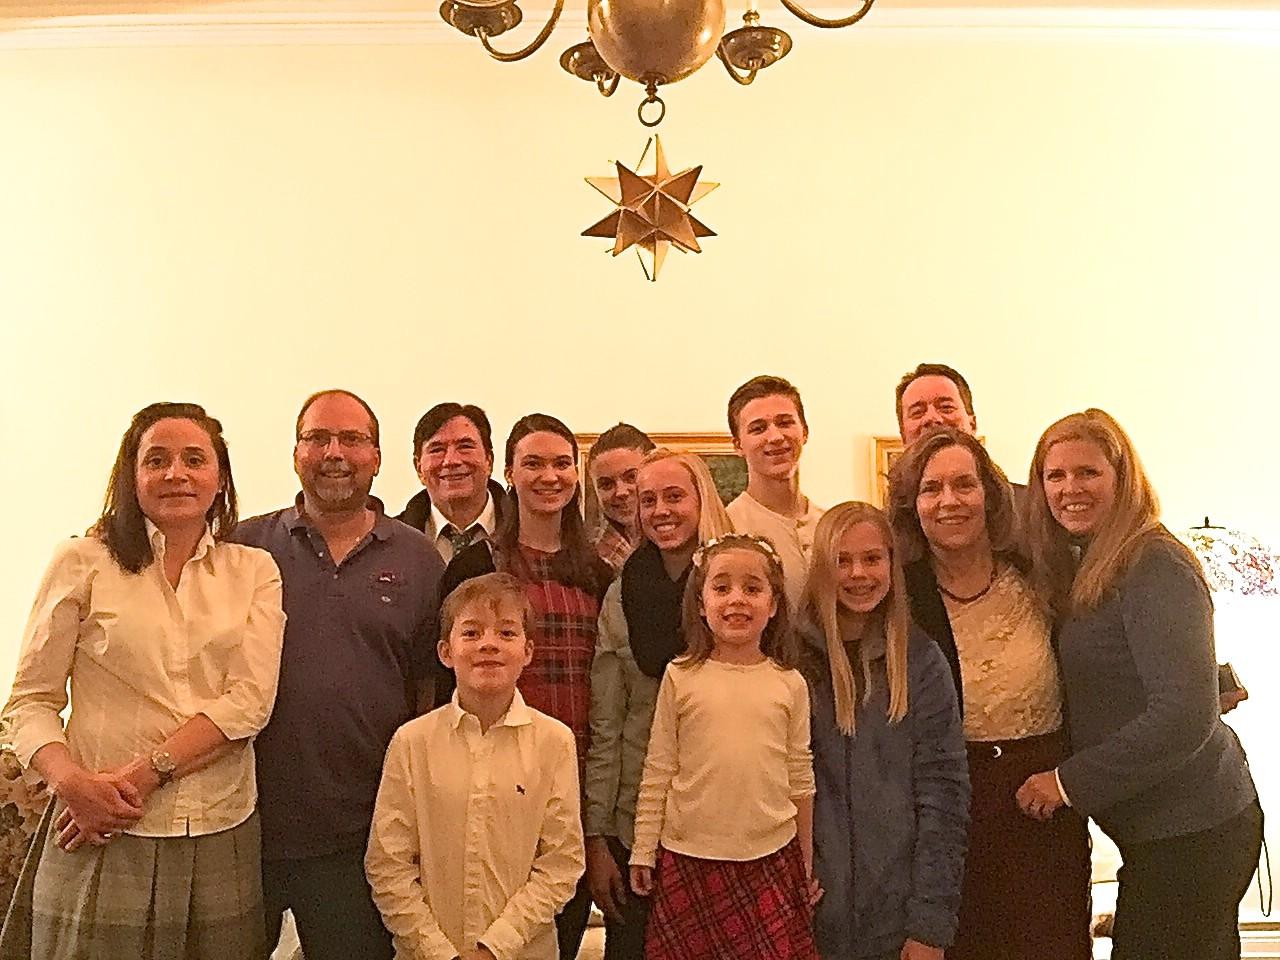 Barbara, Jerry, John, Ellie, Kate, Brooke, Jack, Jon Boylan; front, Alexandre, Charlotte, Brianna, Lorraine, Lisa